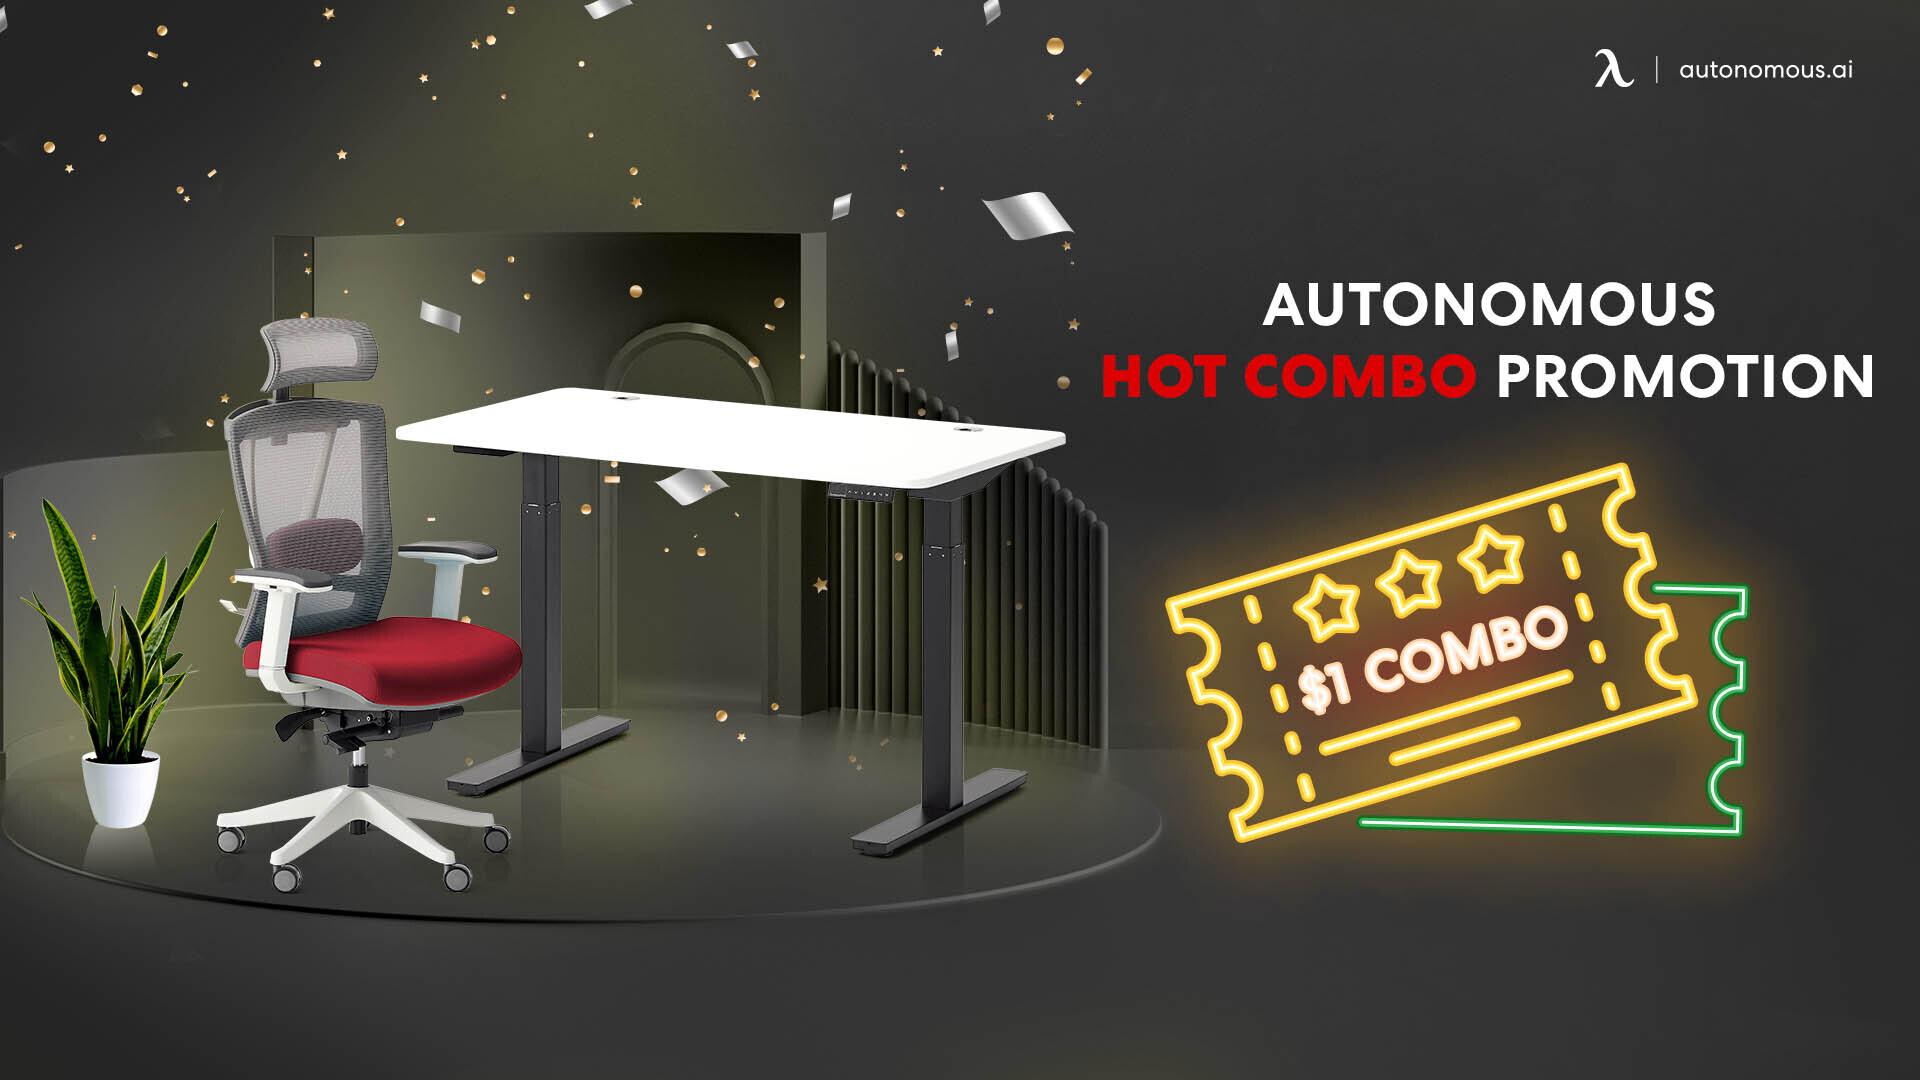 Autonomous Hot Combo 1 dollar